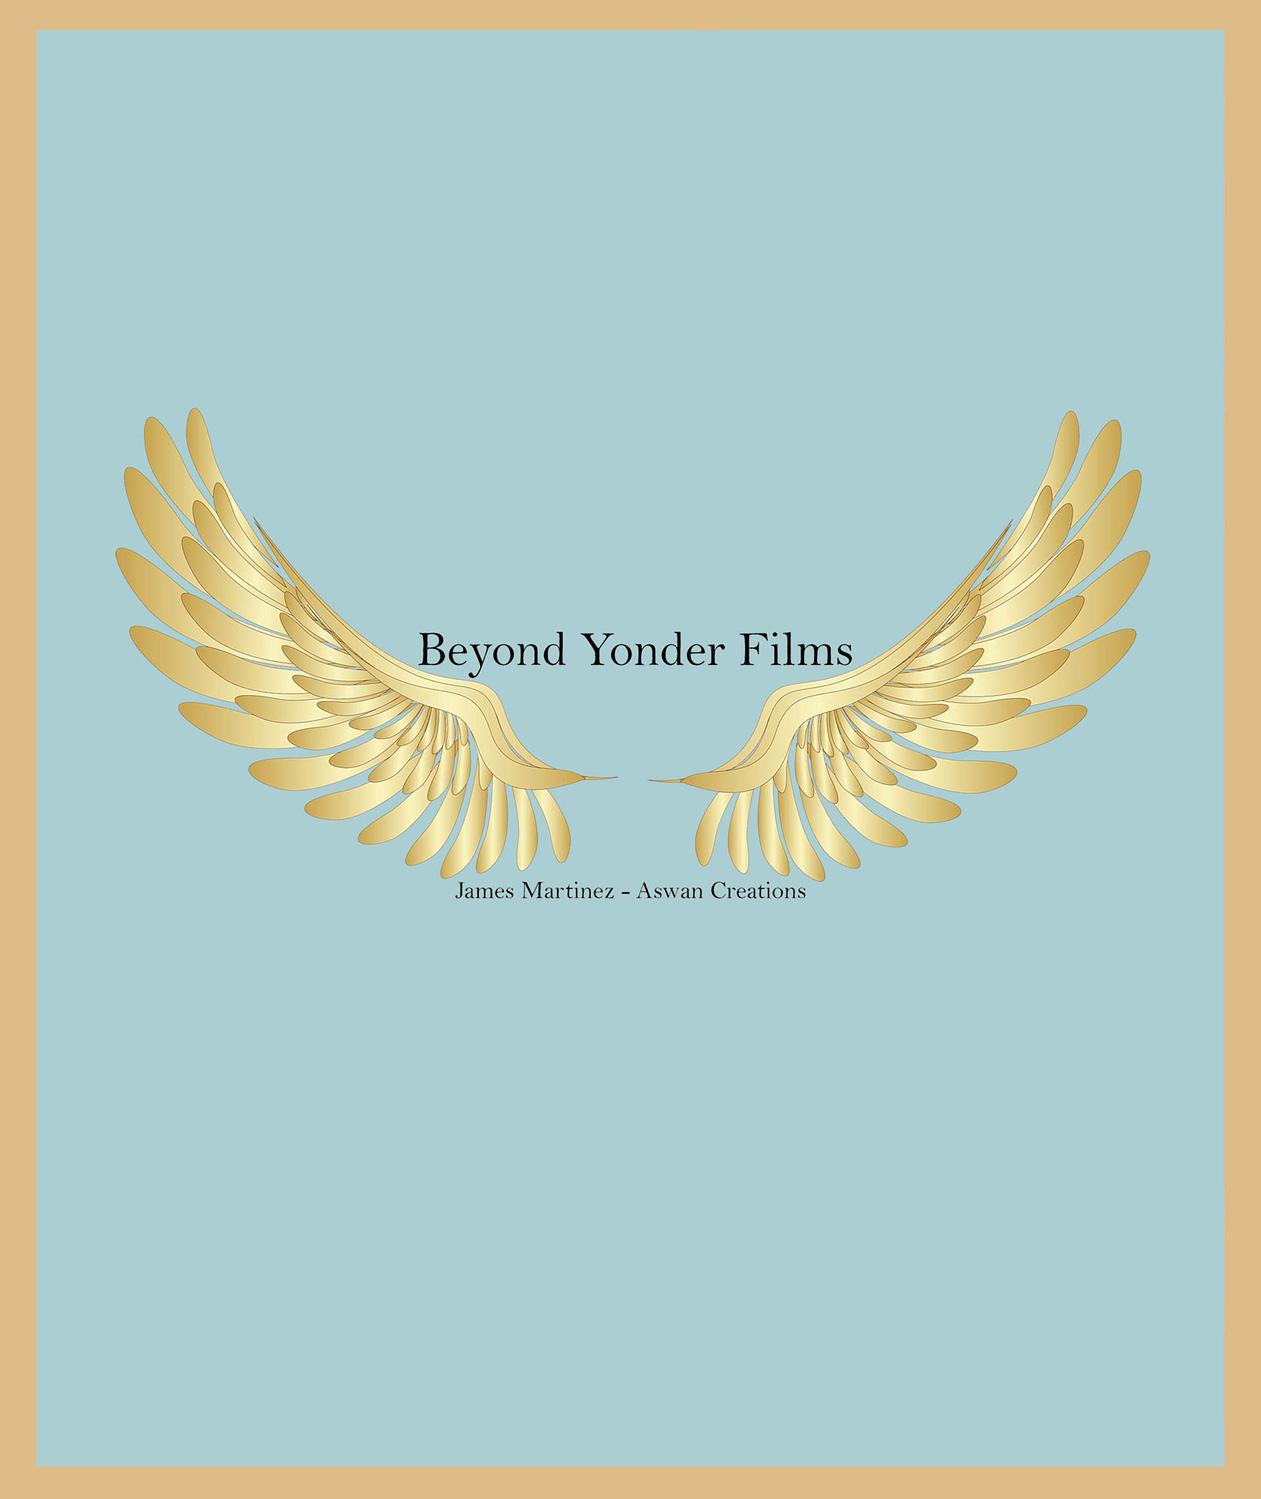 Beyond Yonder Films 3 - James Martinez - Aswan Creations